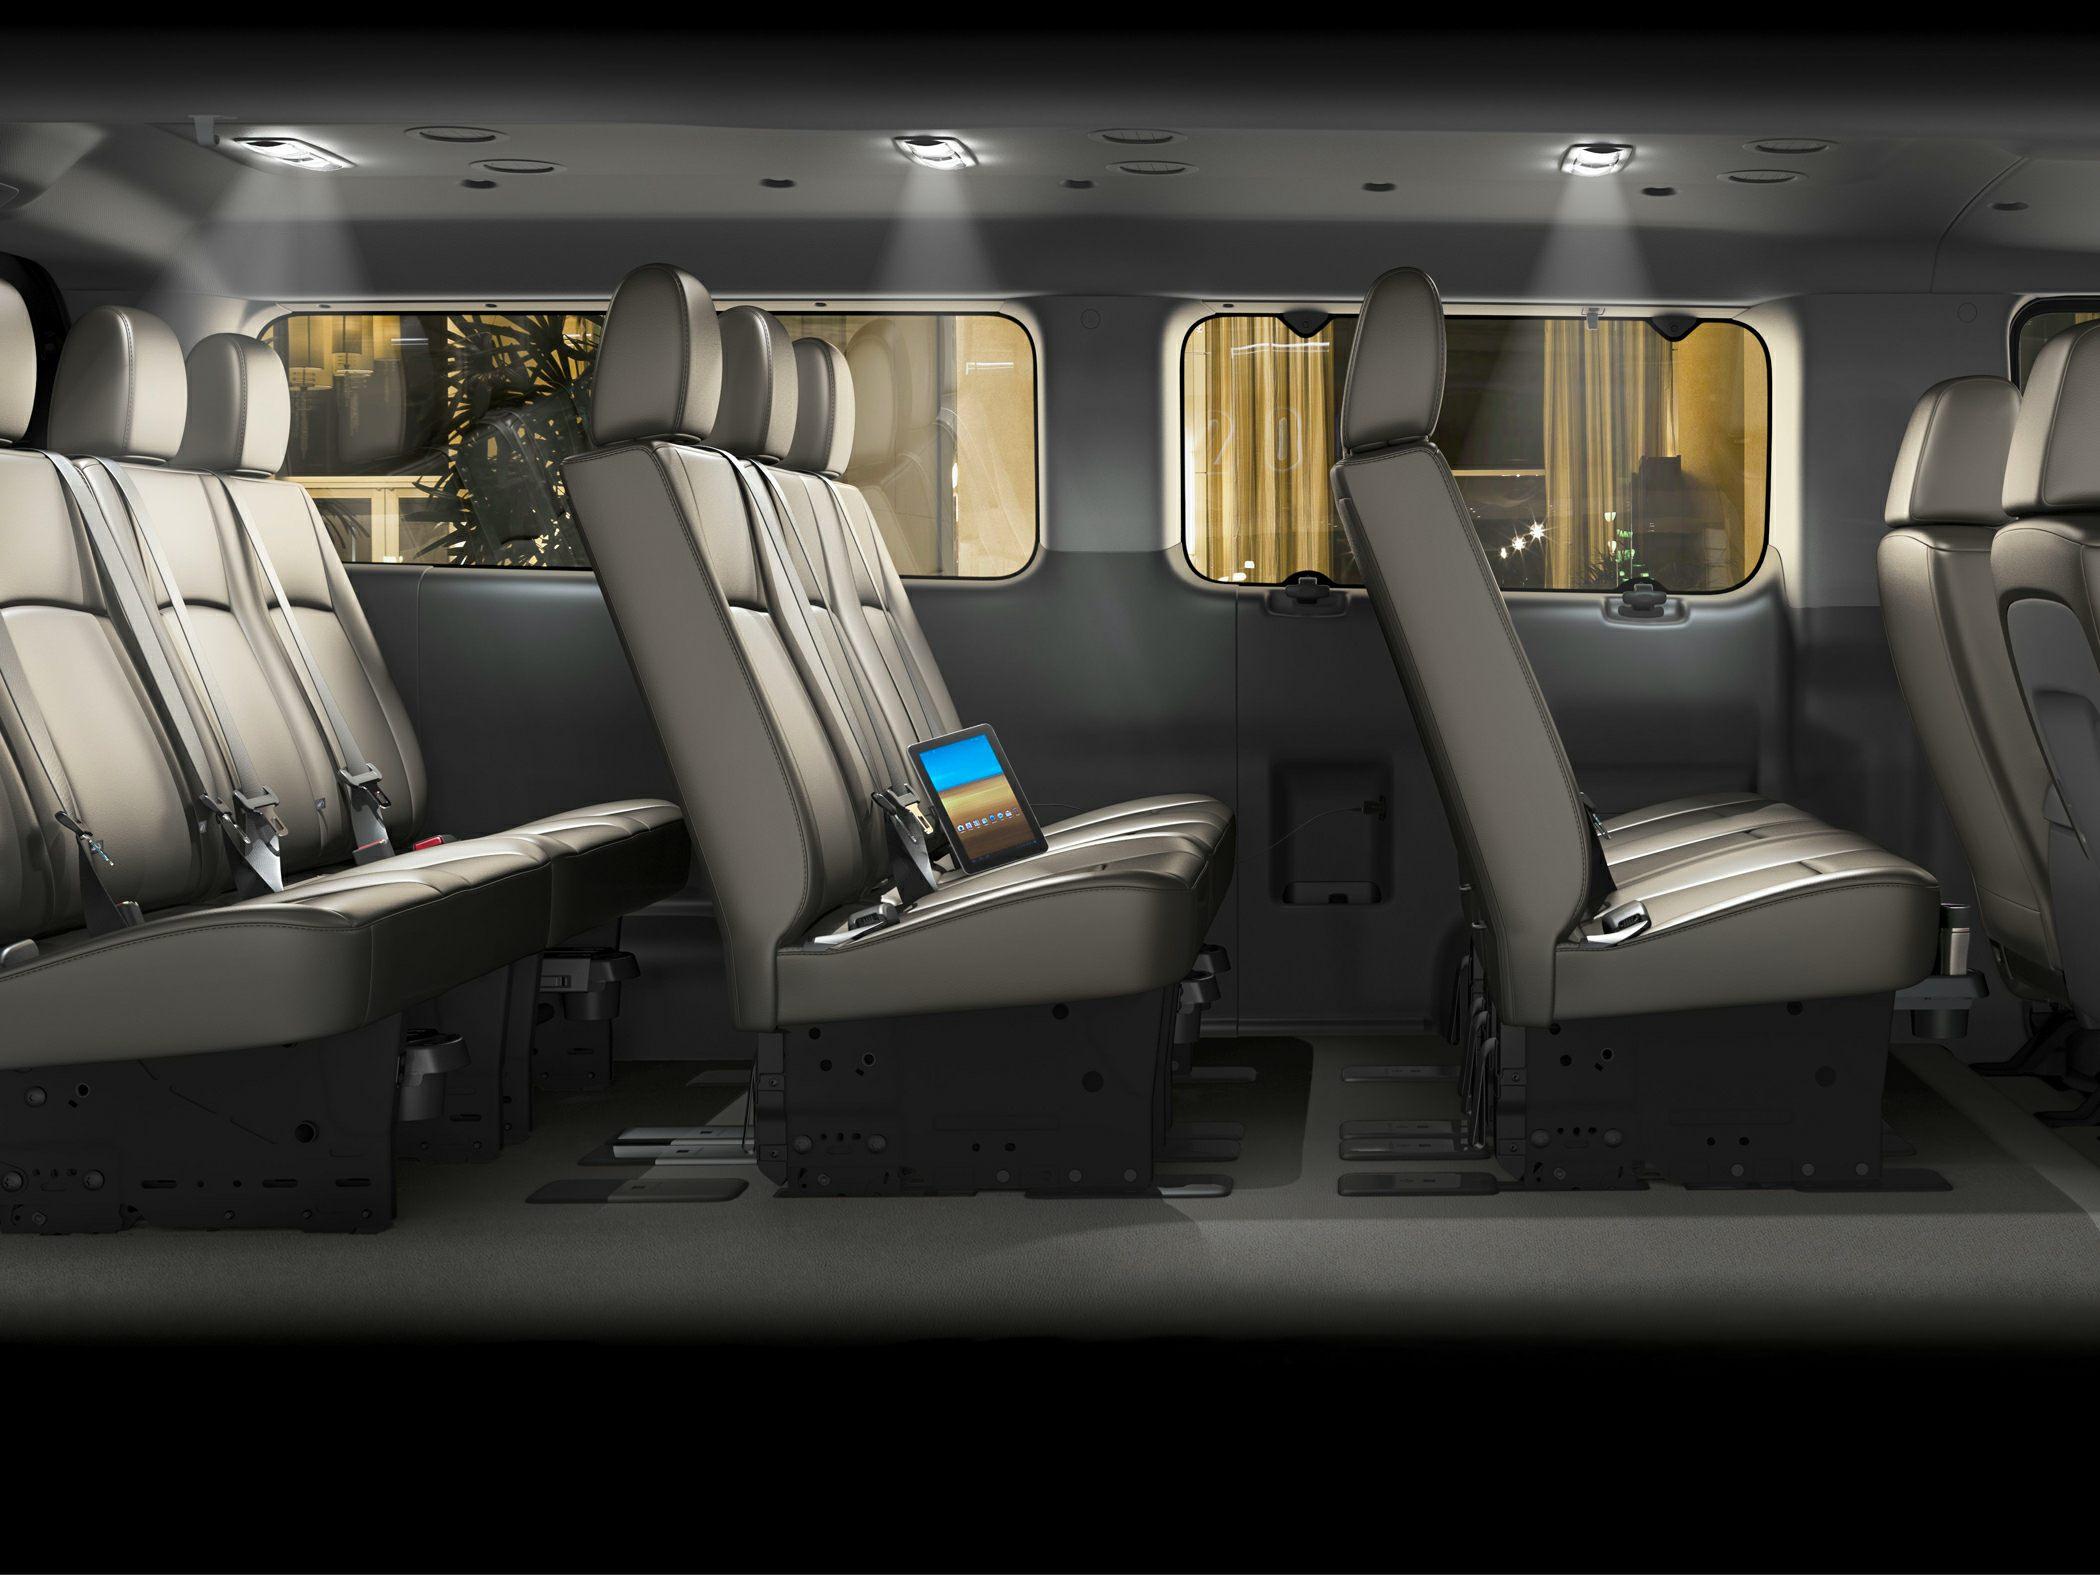 2017 nissan nv passenger nv3500 hd deals prices incentives leases overview carsdirect. Black Bedroom Furniture Sets. Home Design Ideas